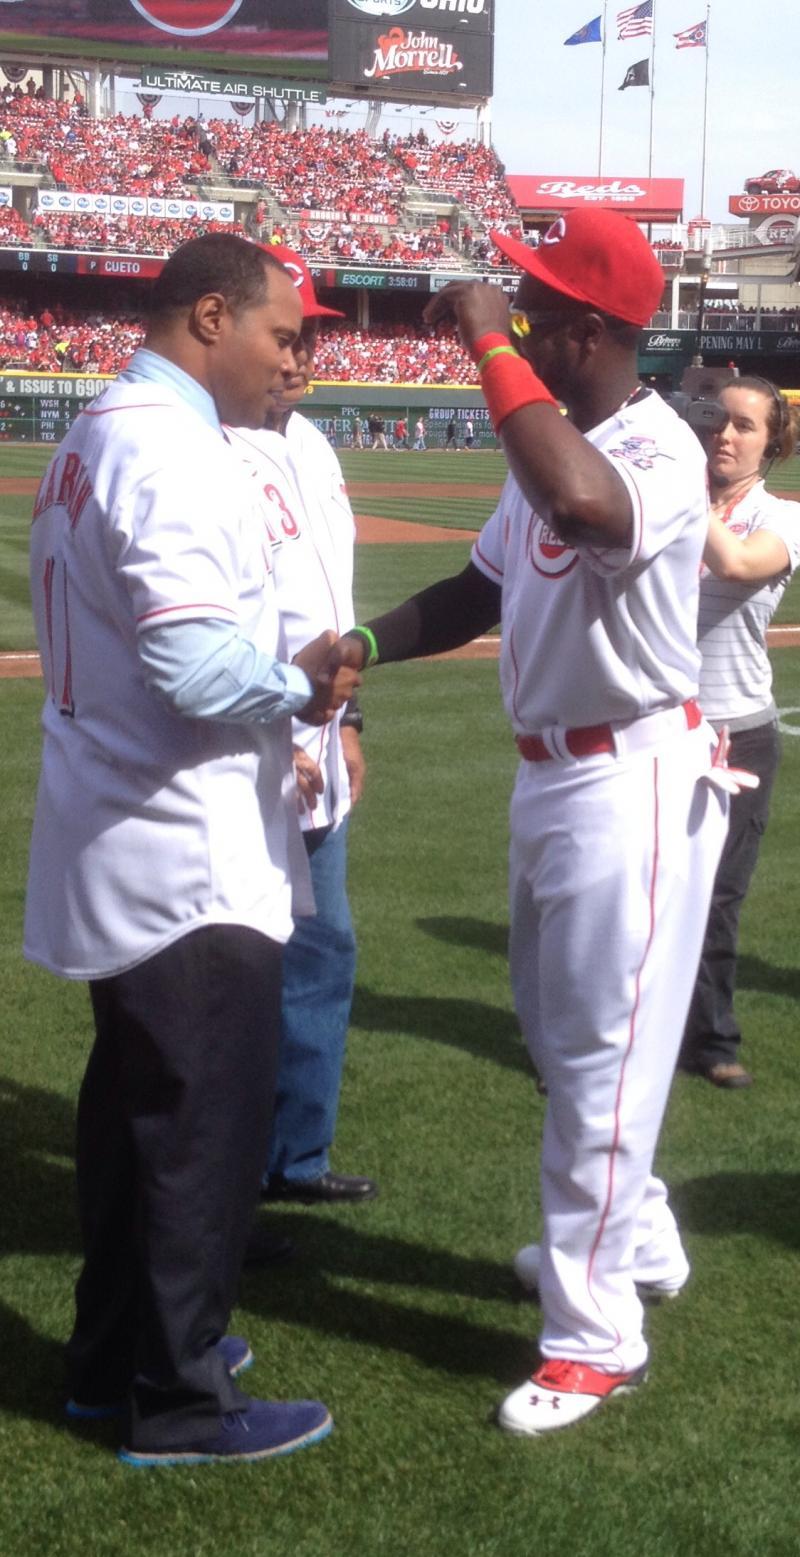 Former Cincinnati Reds great and Baseball Hall of Famer Barry Larkin with 2nd baseman Brandon Phillips